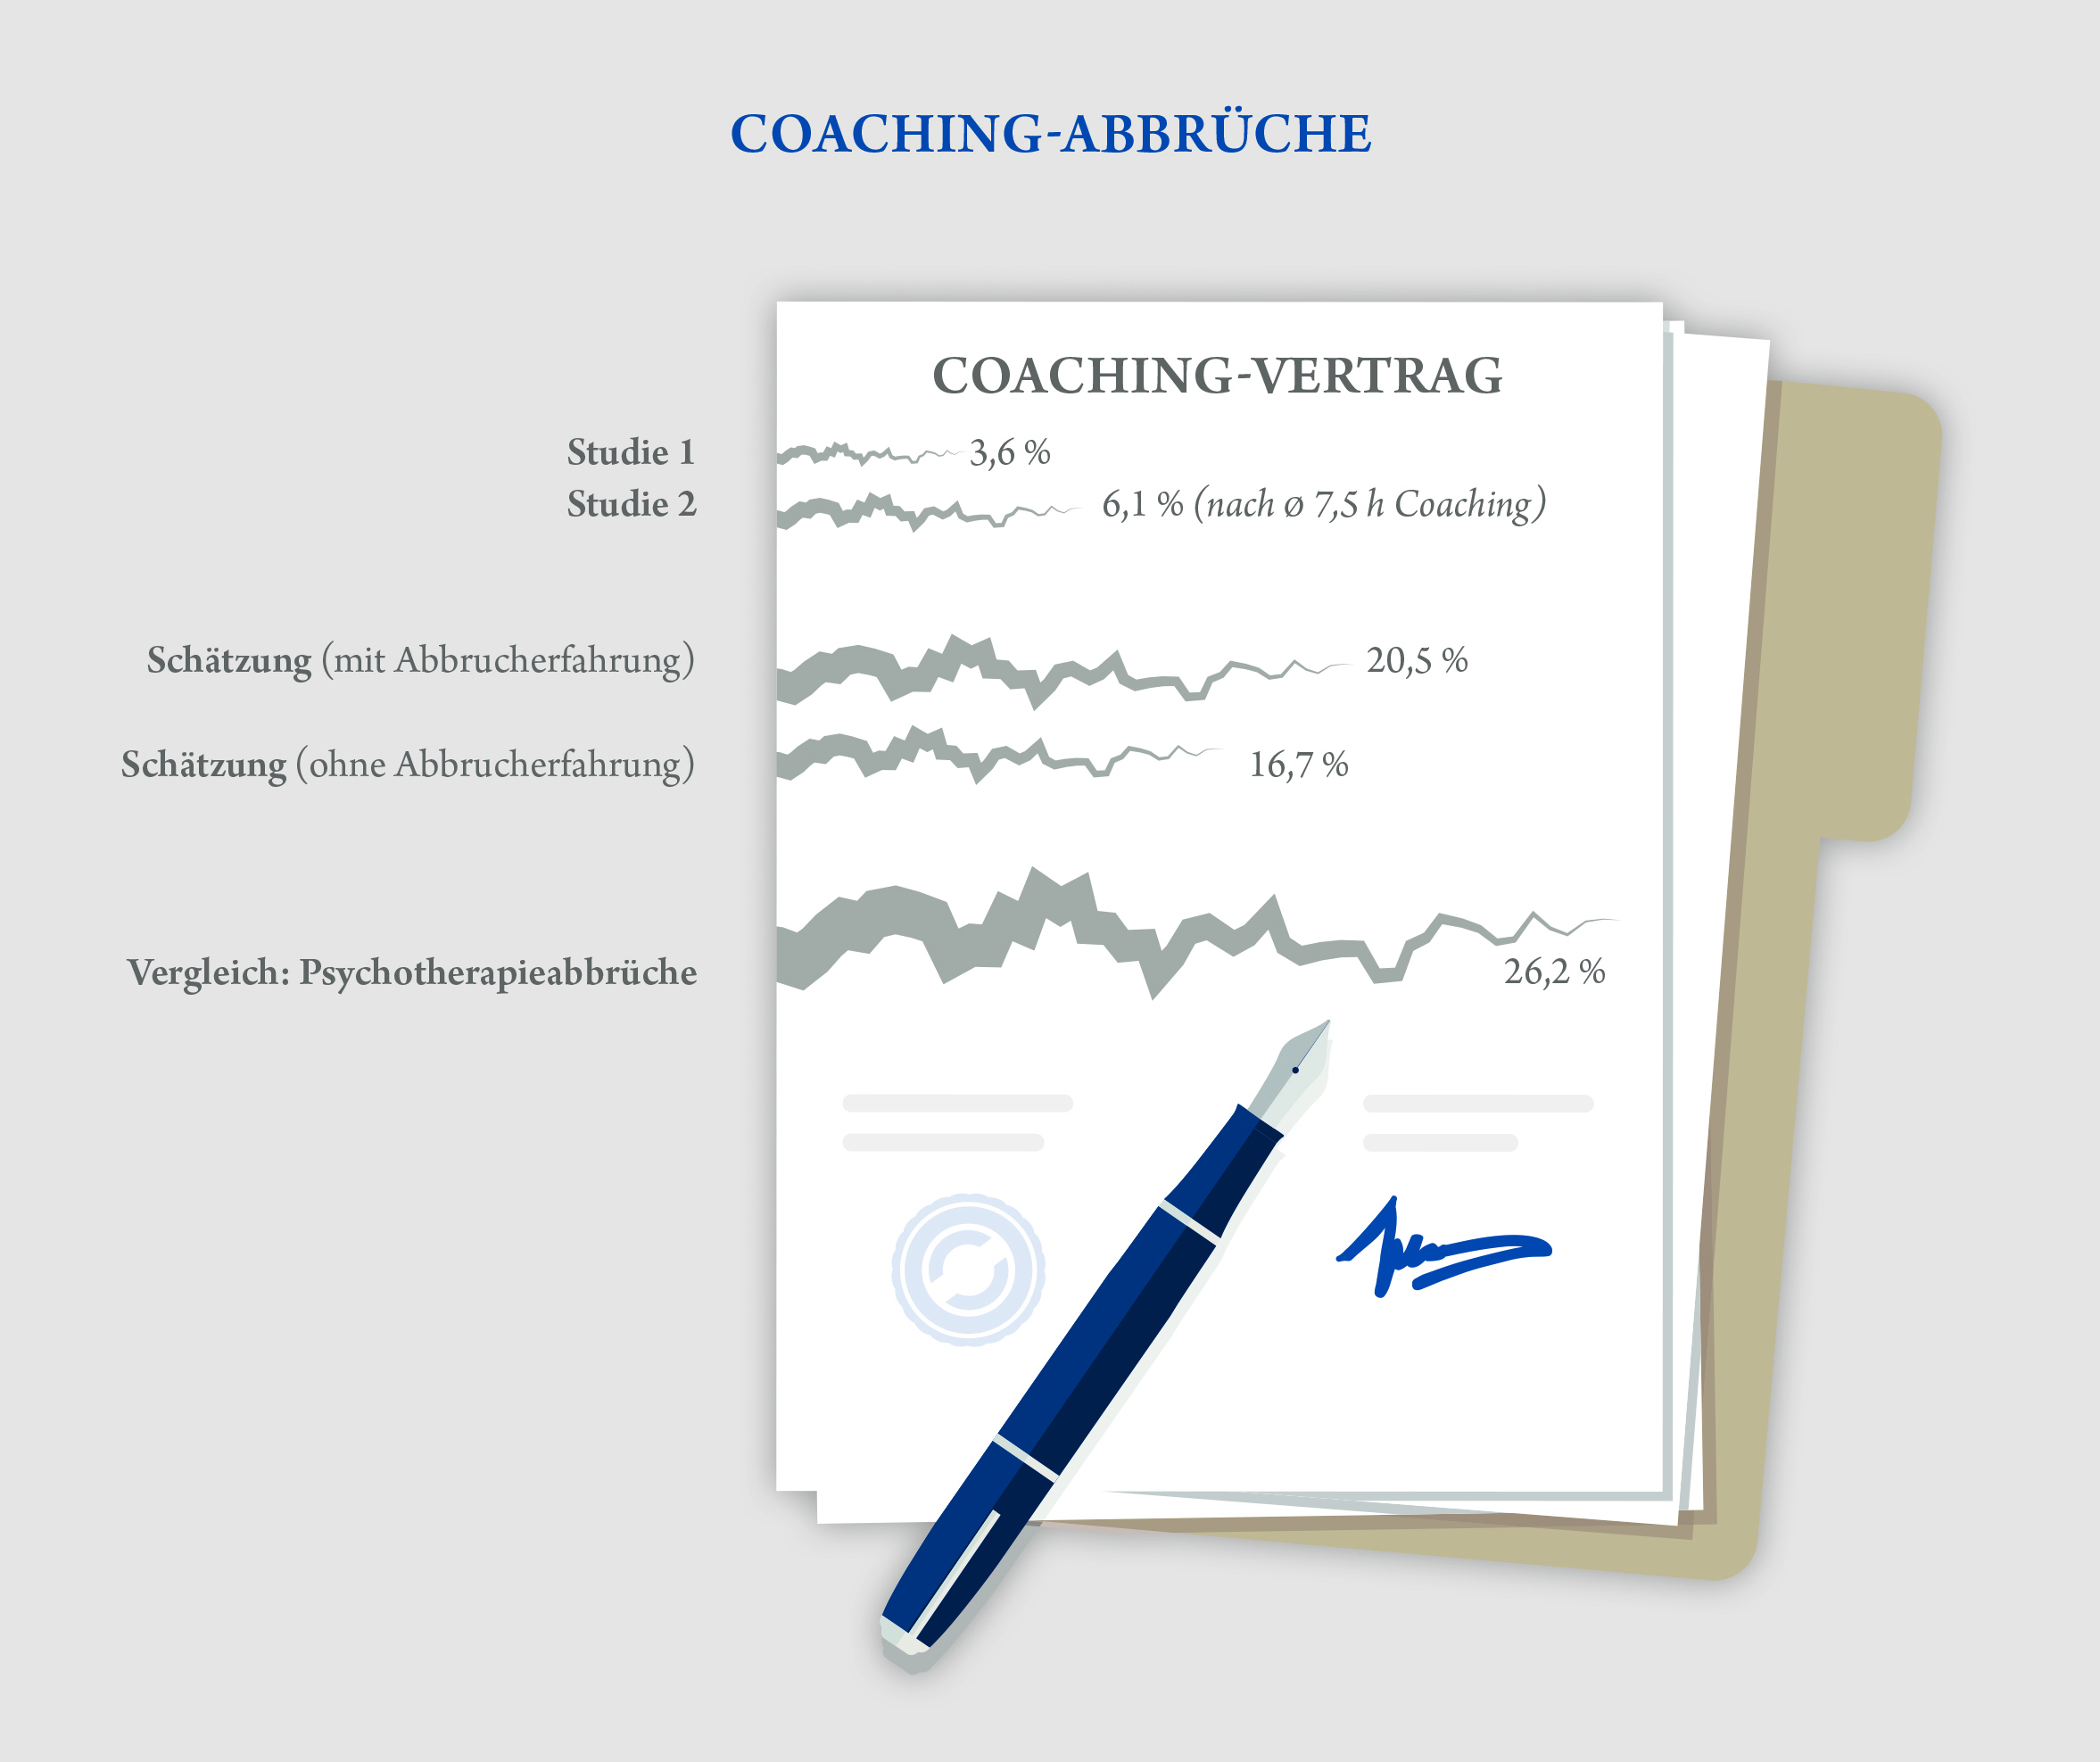 Coaching-Abbrüche